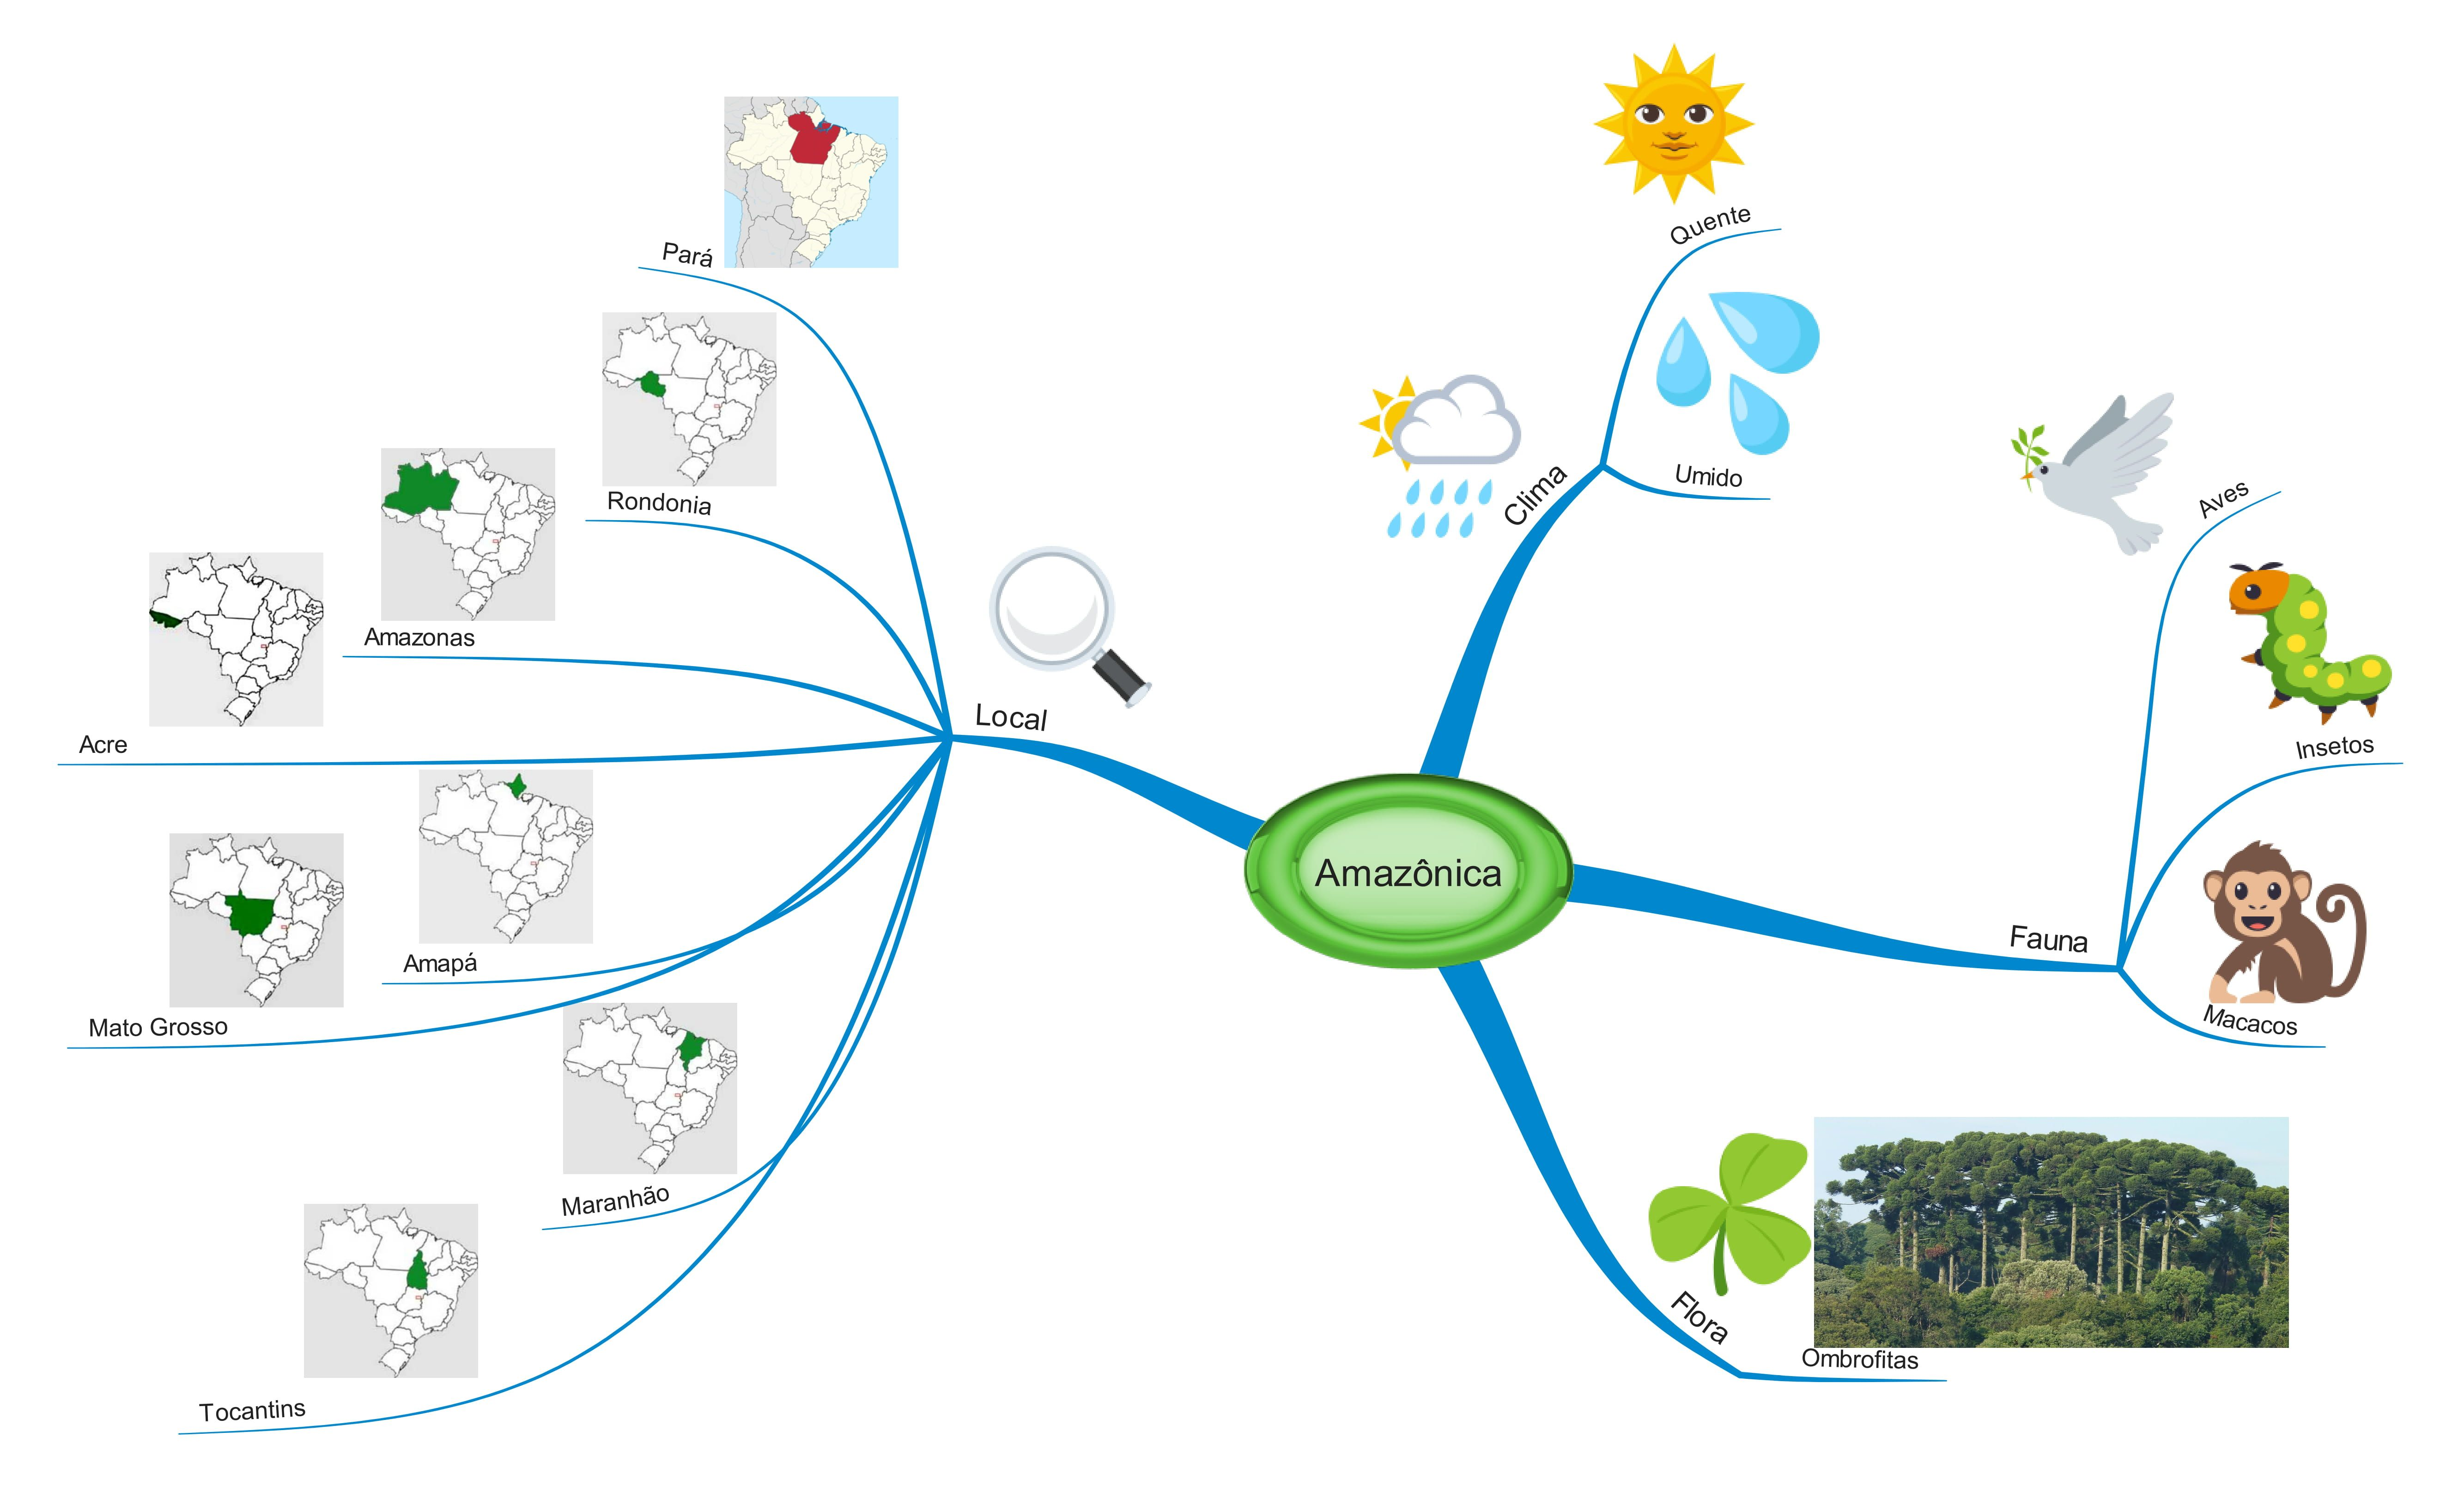 biomas brasileiros mapa mental amazonia | 精神地図 | Pinterest